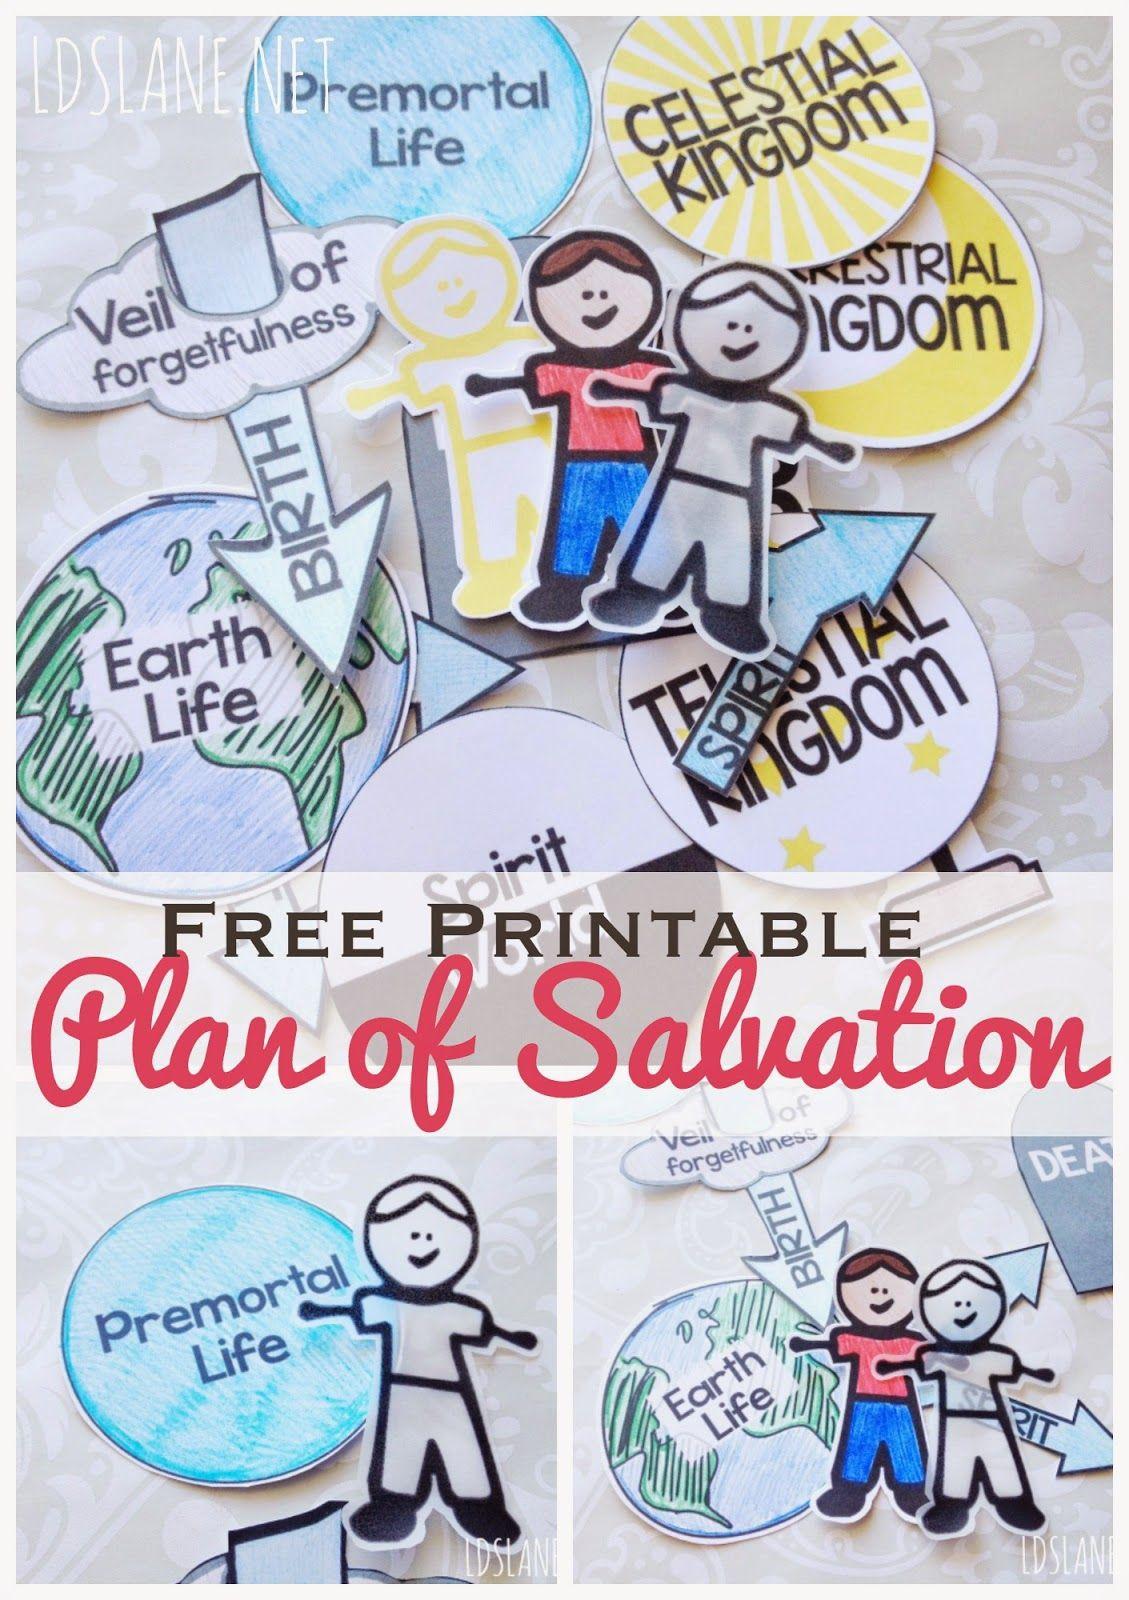 Family Home Evening Series Plan Of Salvation Ldslane